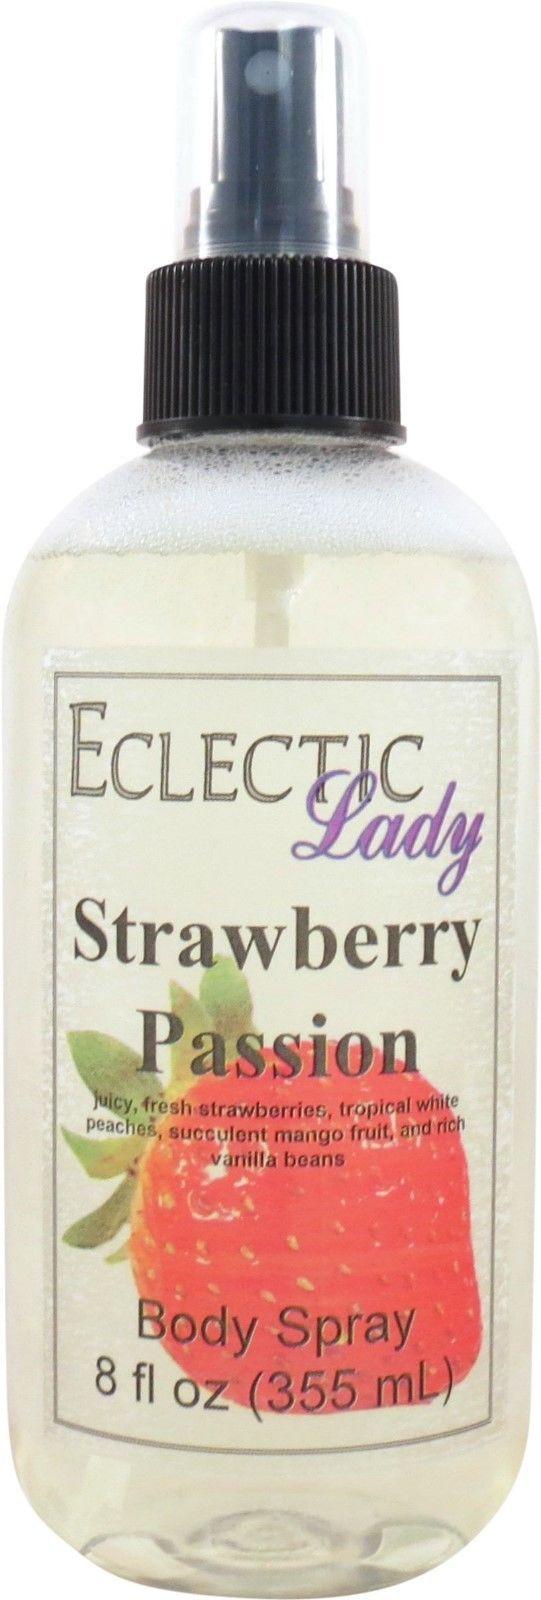 Strawberry Passion Body Spray